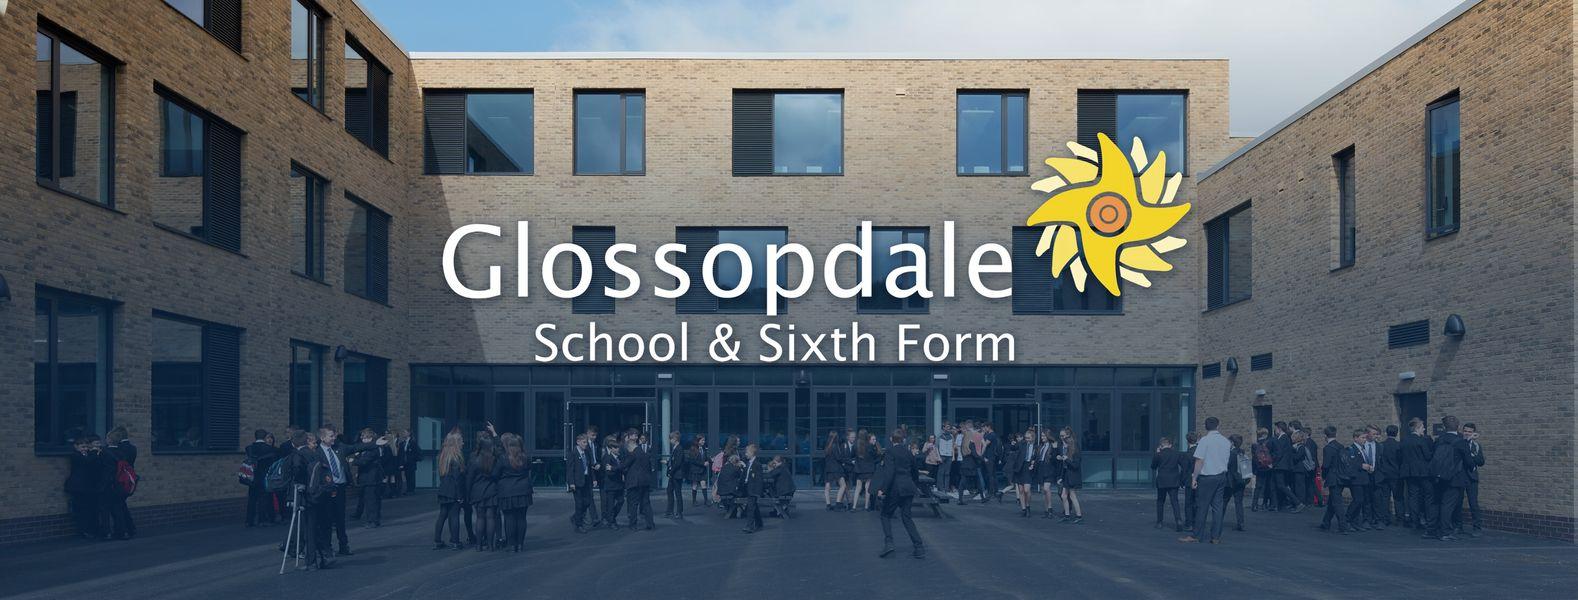 Glossopdale School